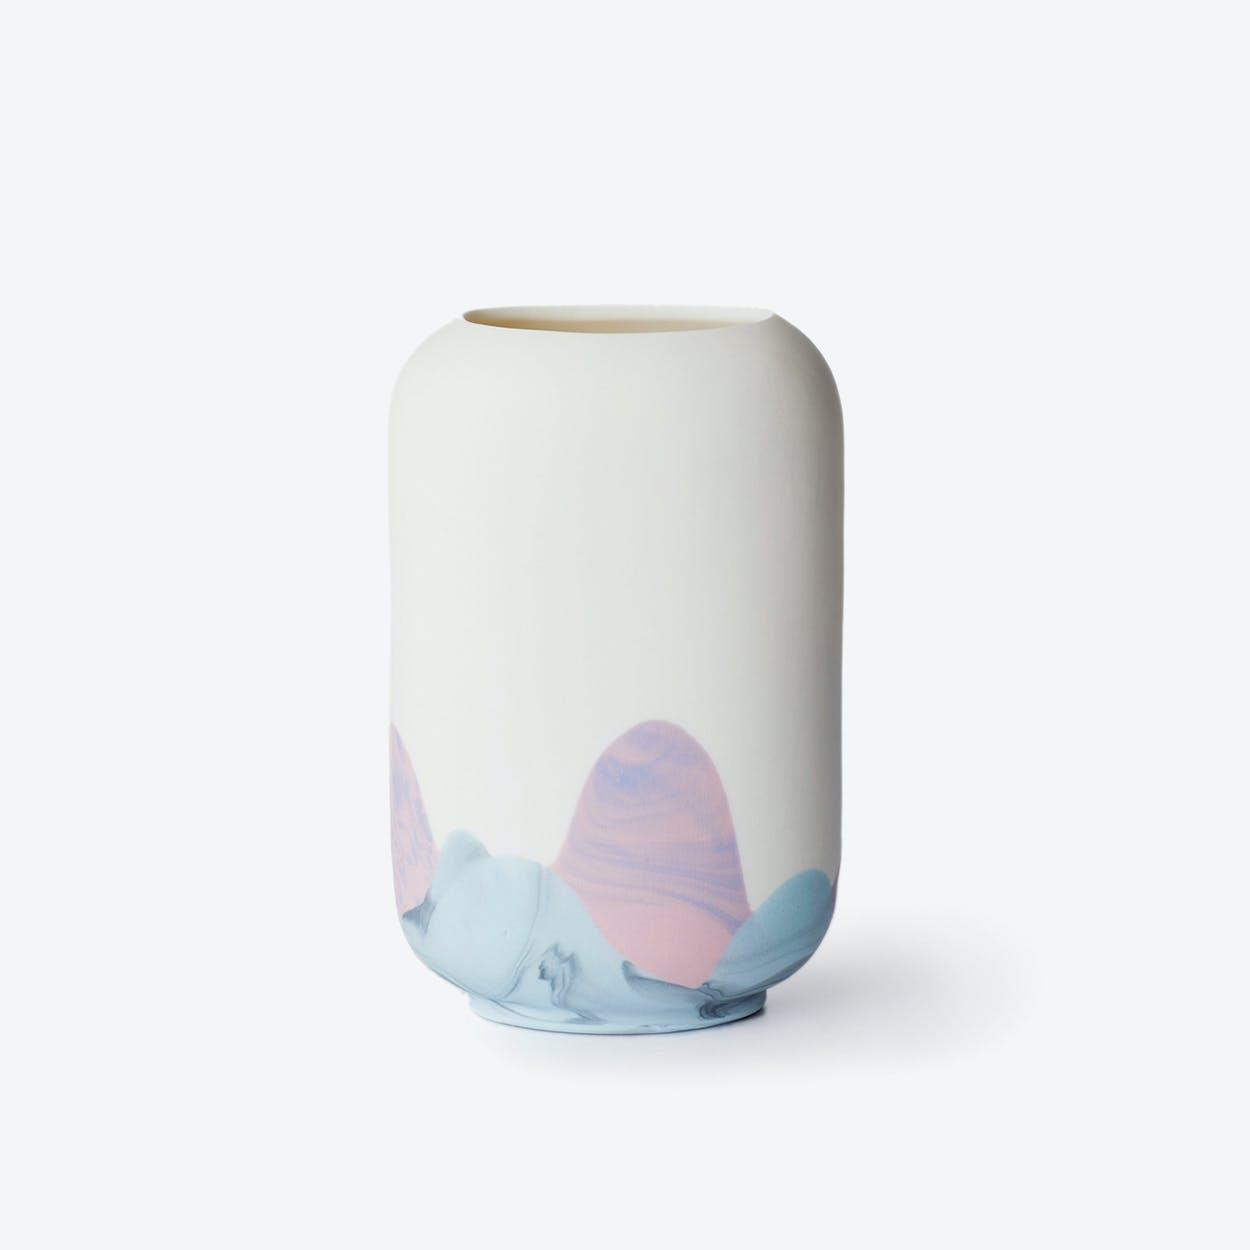 Porcelain Hong Kong Inspired Vase - Sheung Wan